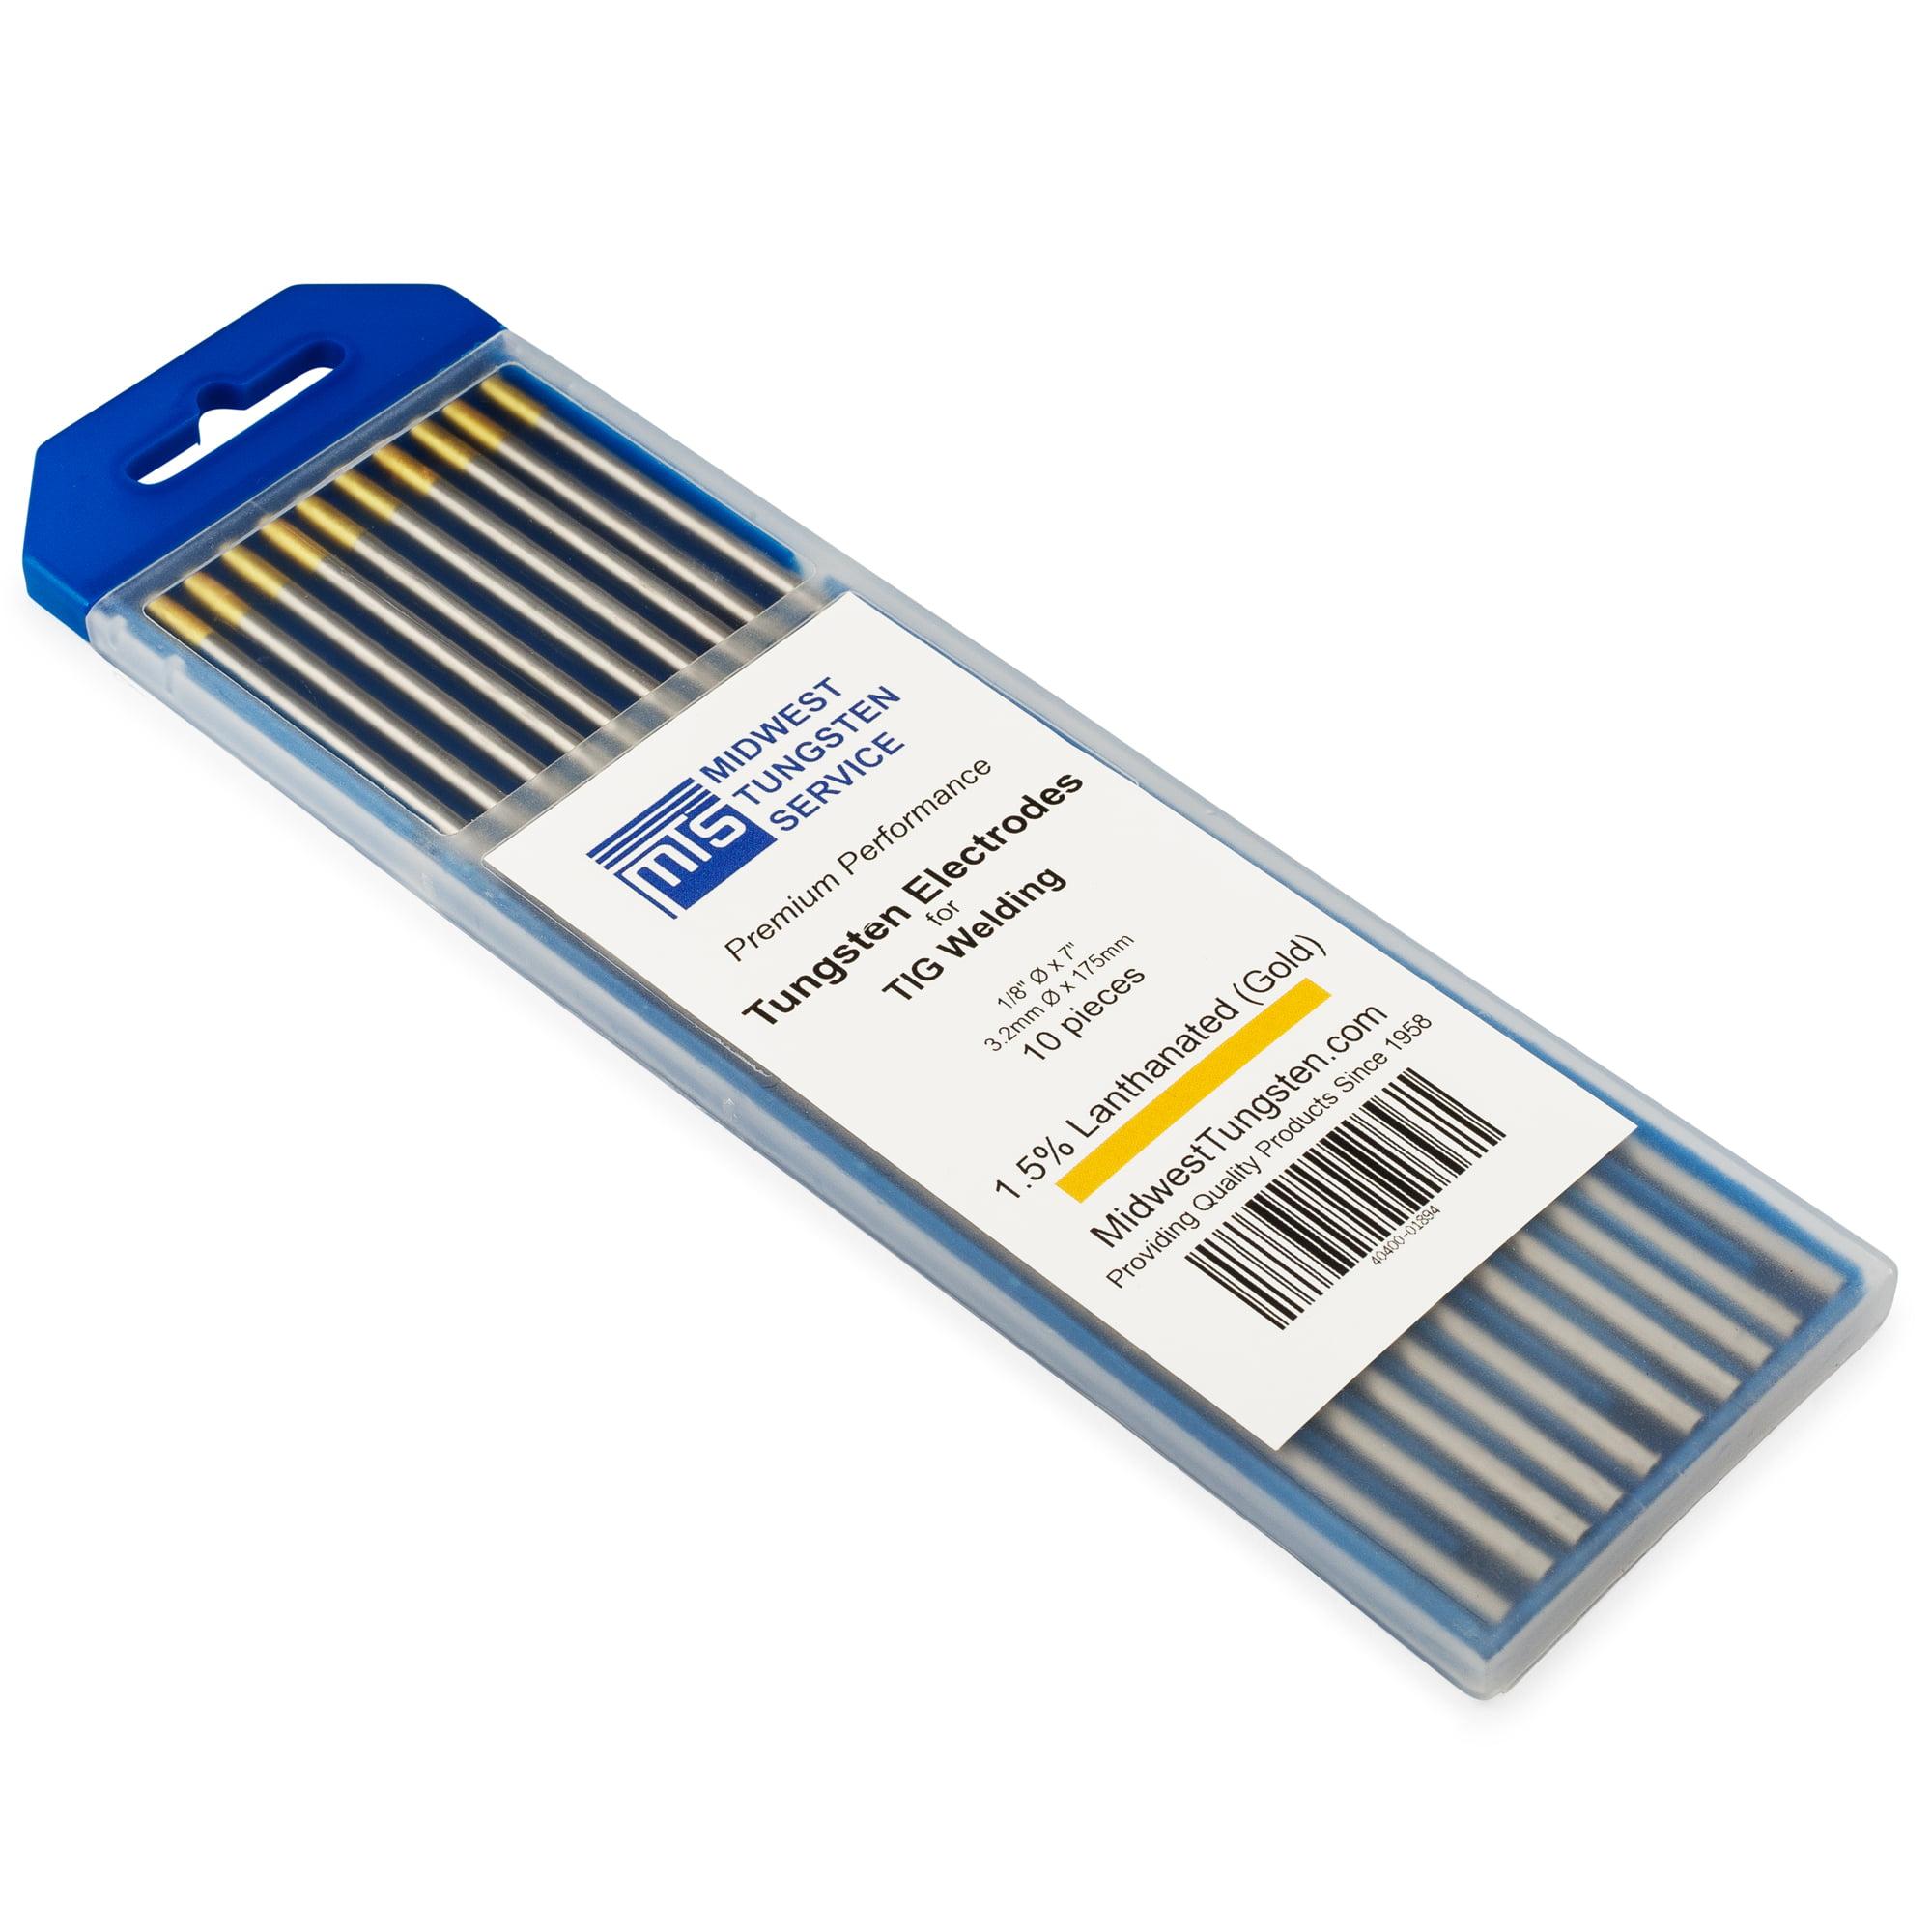 "TIG Welding Tungsten Electrodes 1.5% Lanthanated 1/8"" x 7"" (Gold, WL15) 10-Pack"